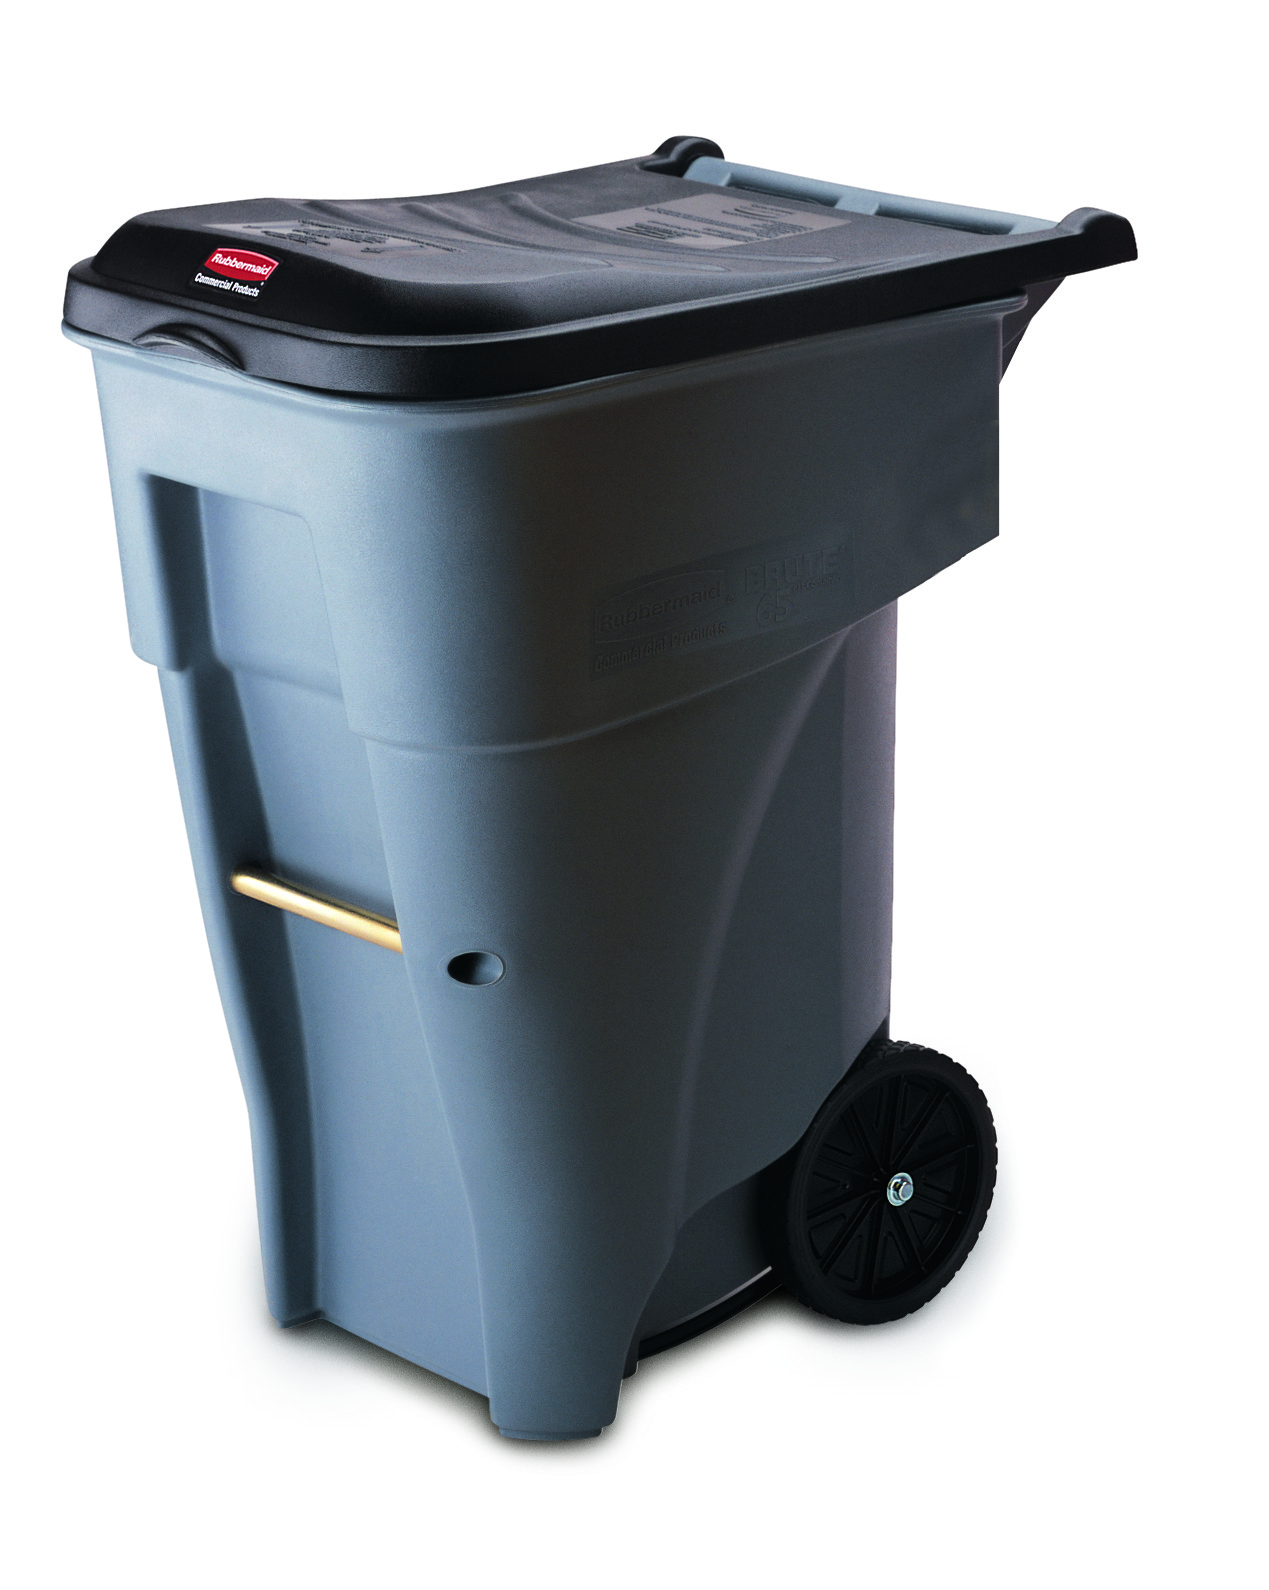 65 Gallon Trash Can Wheeled Trash Can Trash Cans Warehouse